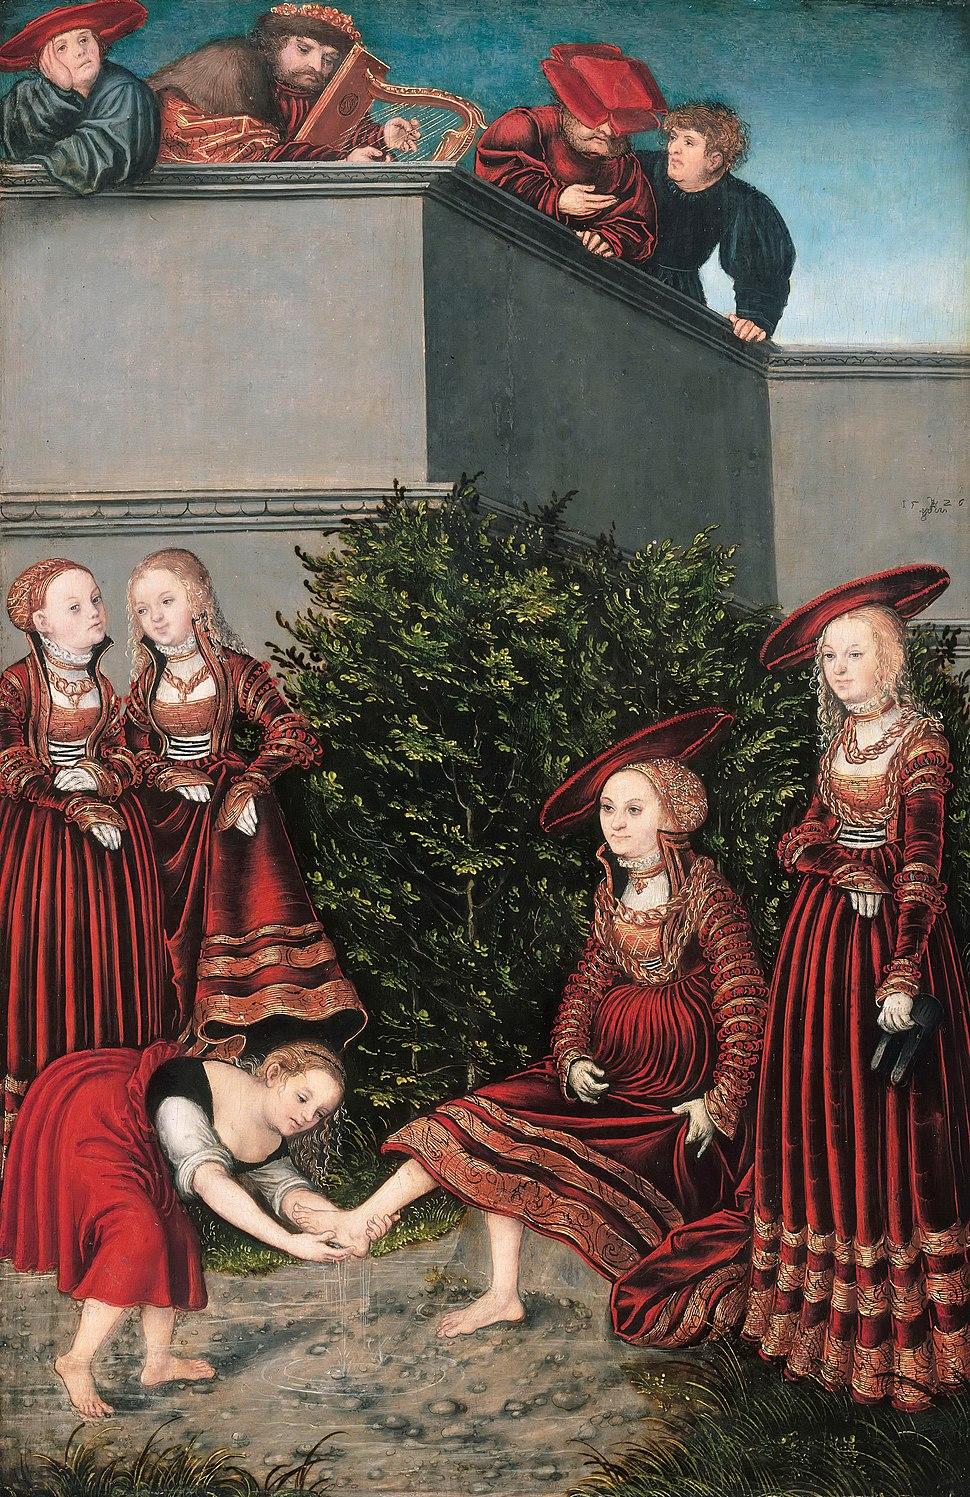 Lucas Cranach d. Ä. - David and Bathsheba - WGA05718